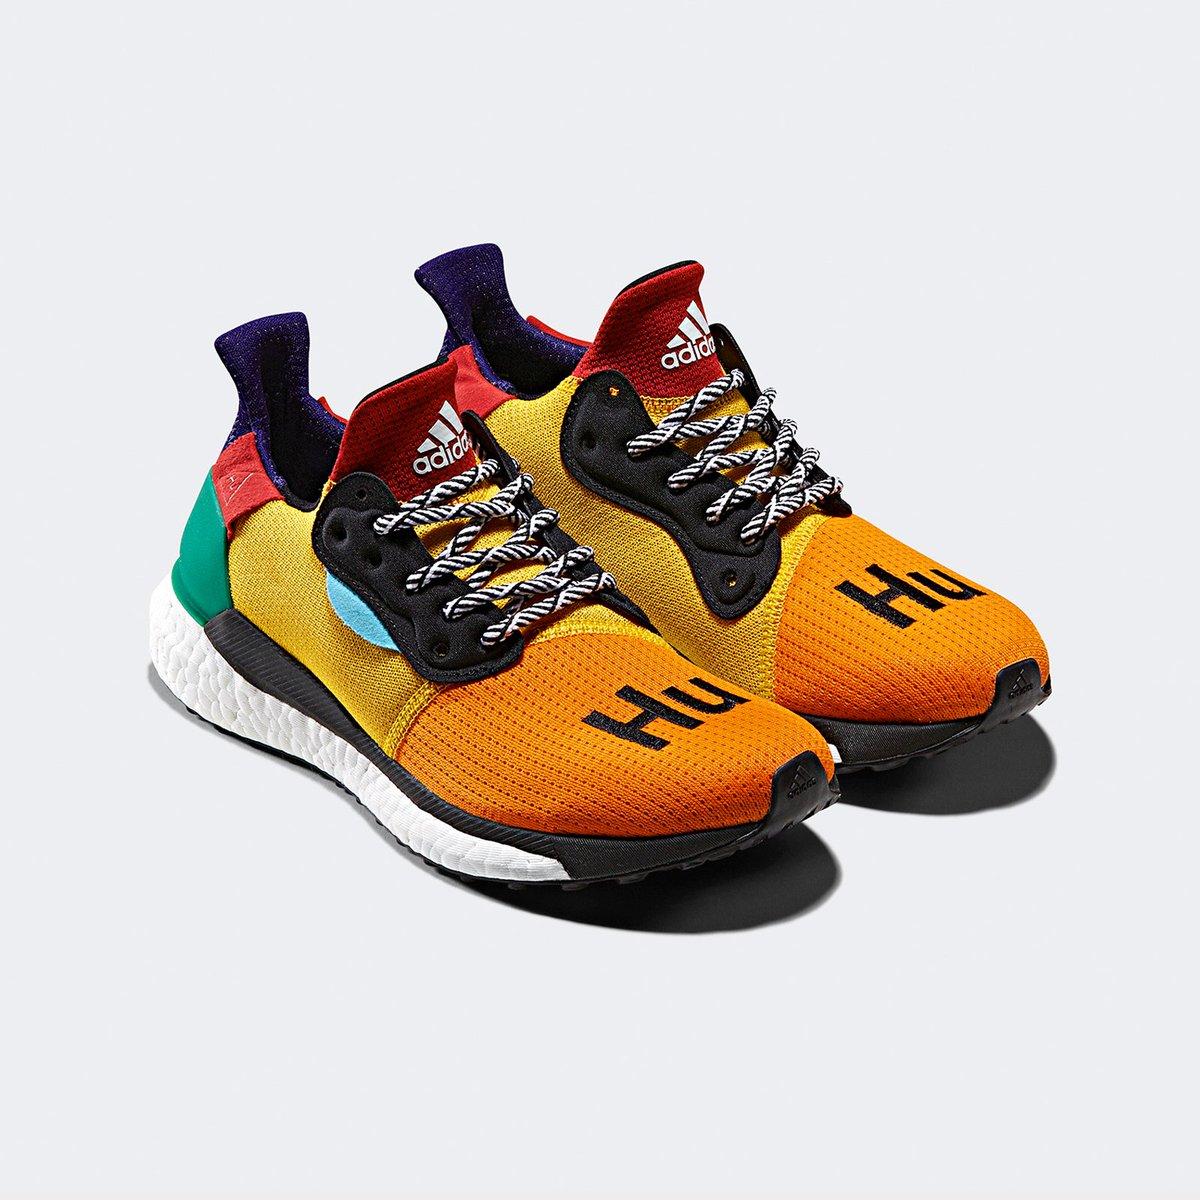 9b0e566d4 Coming soon on  sneakersnstuff.  Pharrell x adidas Solar Hu Glide.  Multicolor https   bit.ly 2LYXyFX Black https   bit.ly 2oH1lP5 White ...